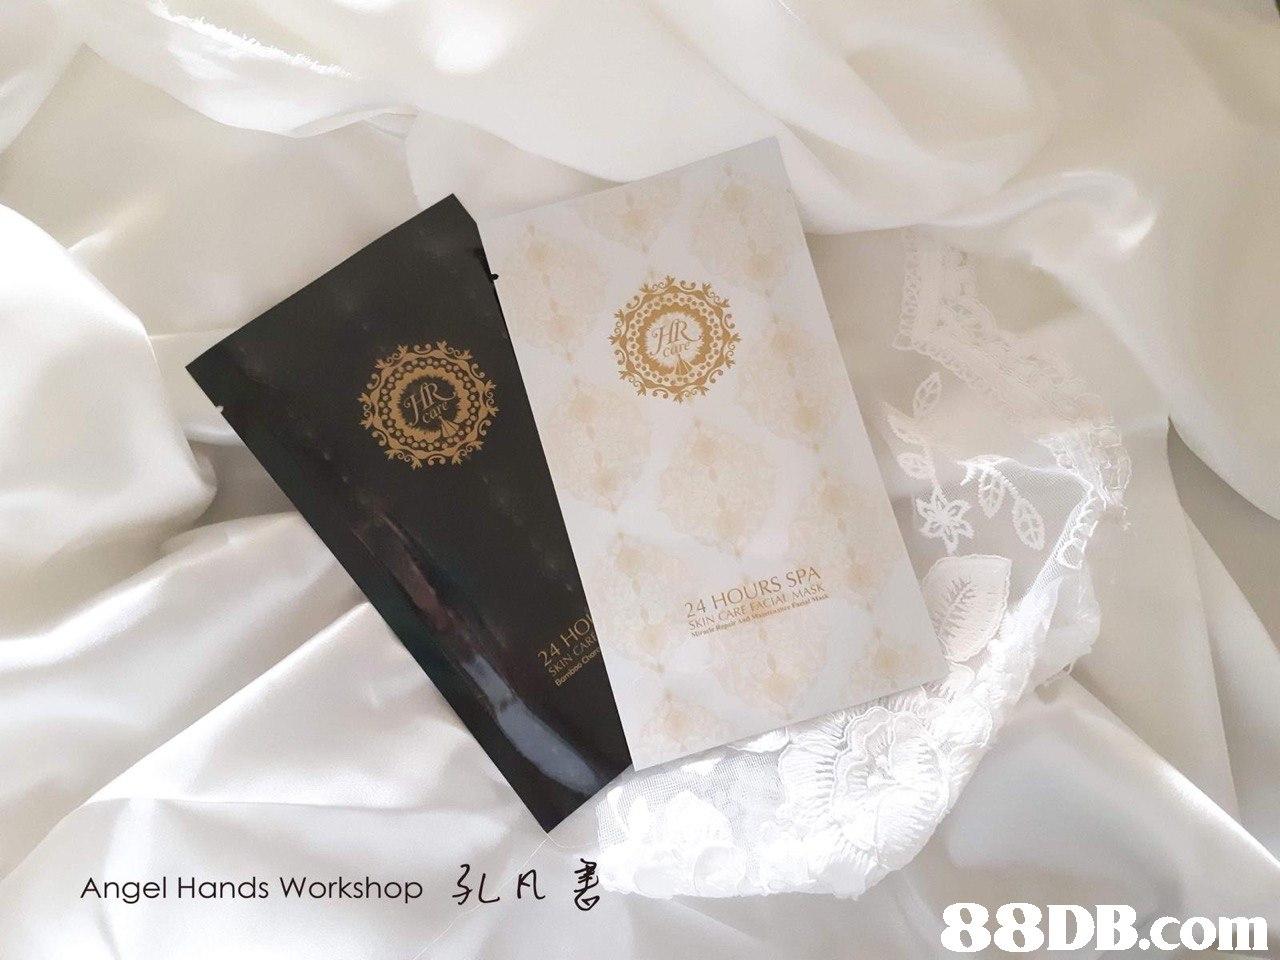 RS SPA Angel Hands Workshop も 88DB.com